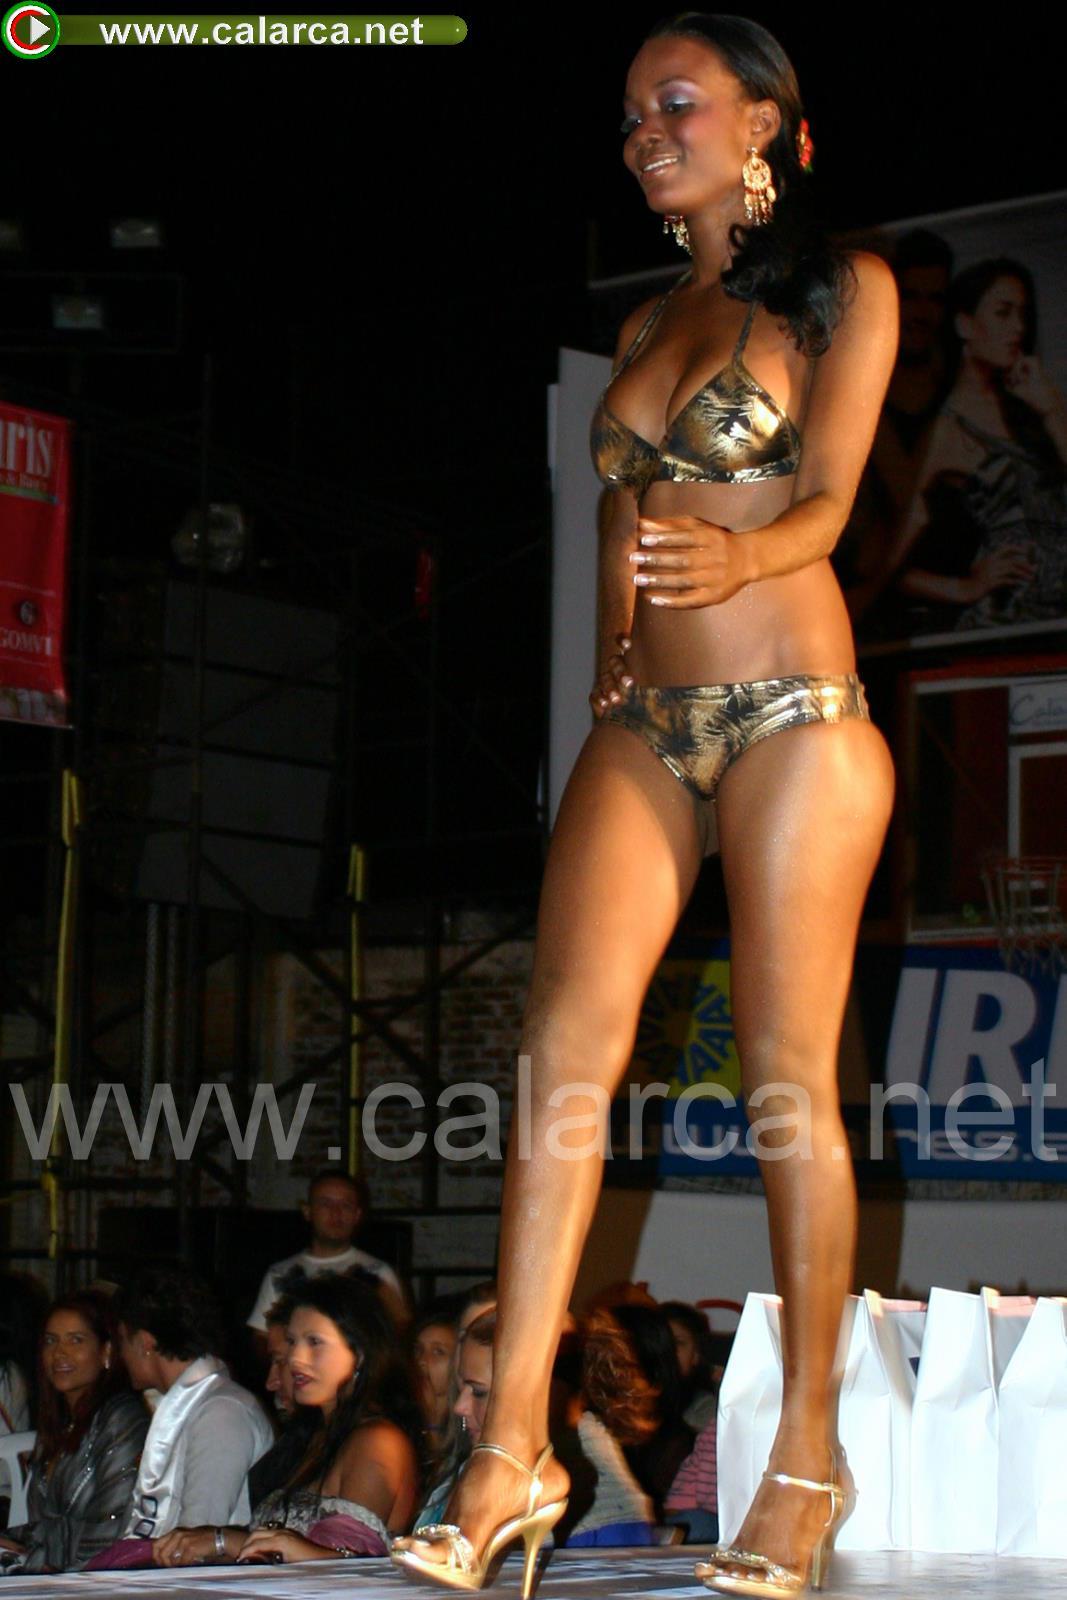 Cauca - Karen Melissa Zúñiga